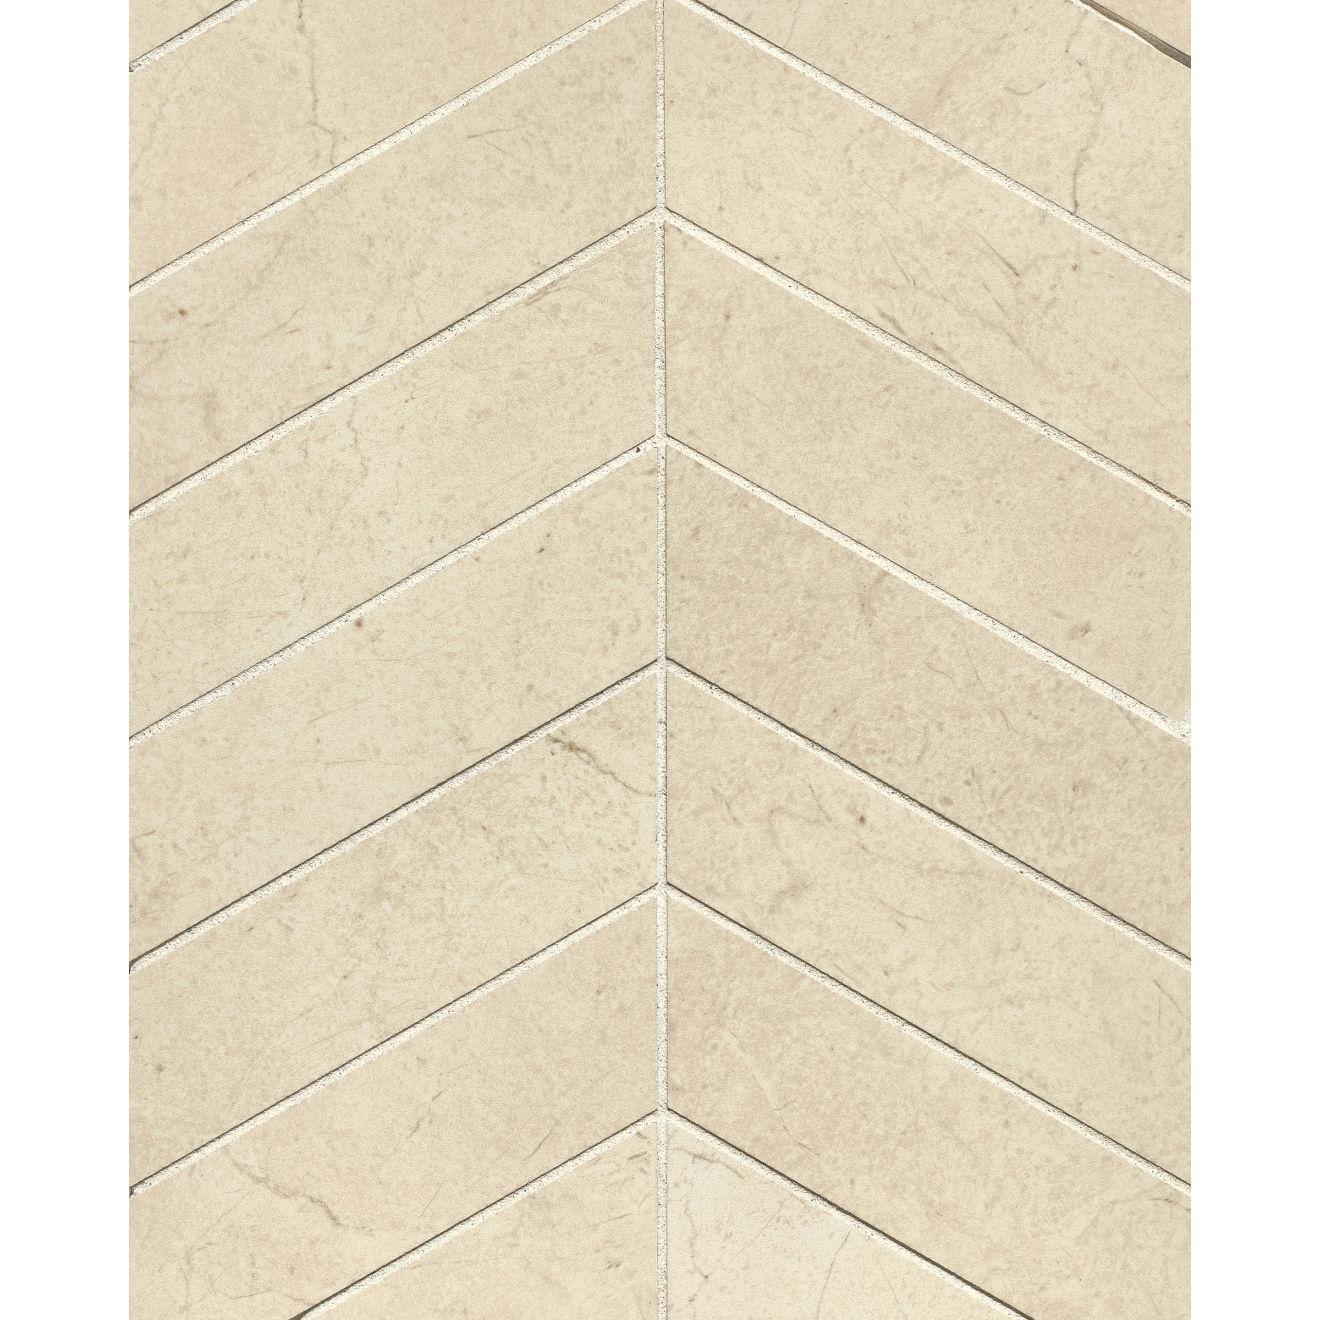 "Marfil 2"" x 2"" Floor & Wall Mosaic in Bianco"